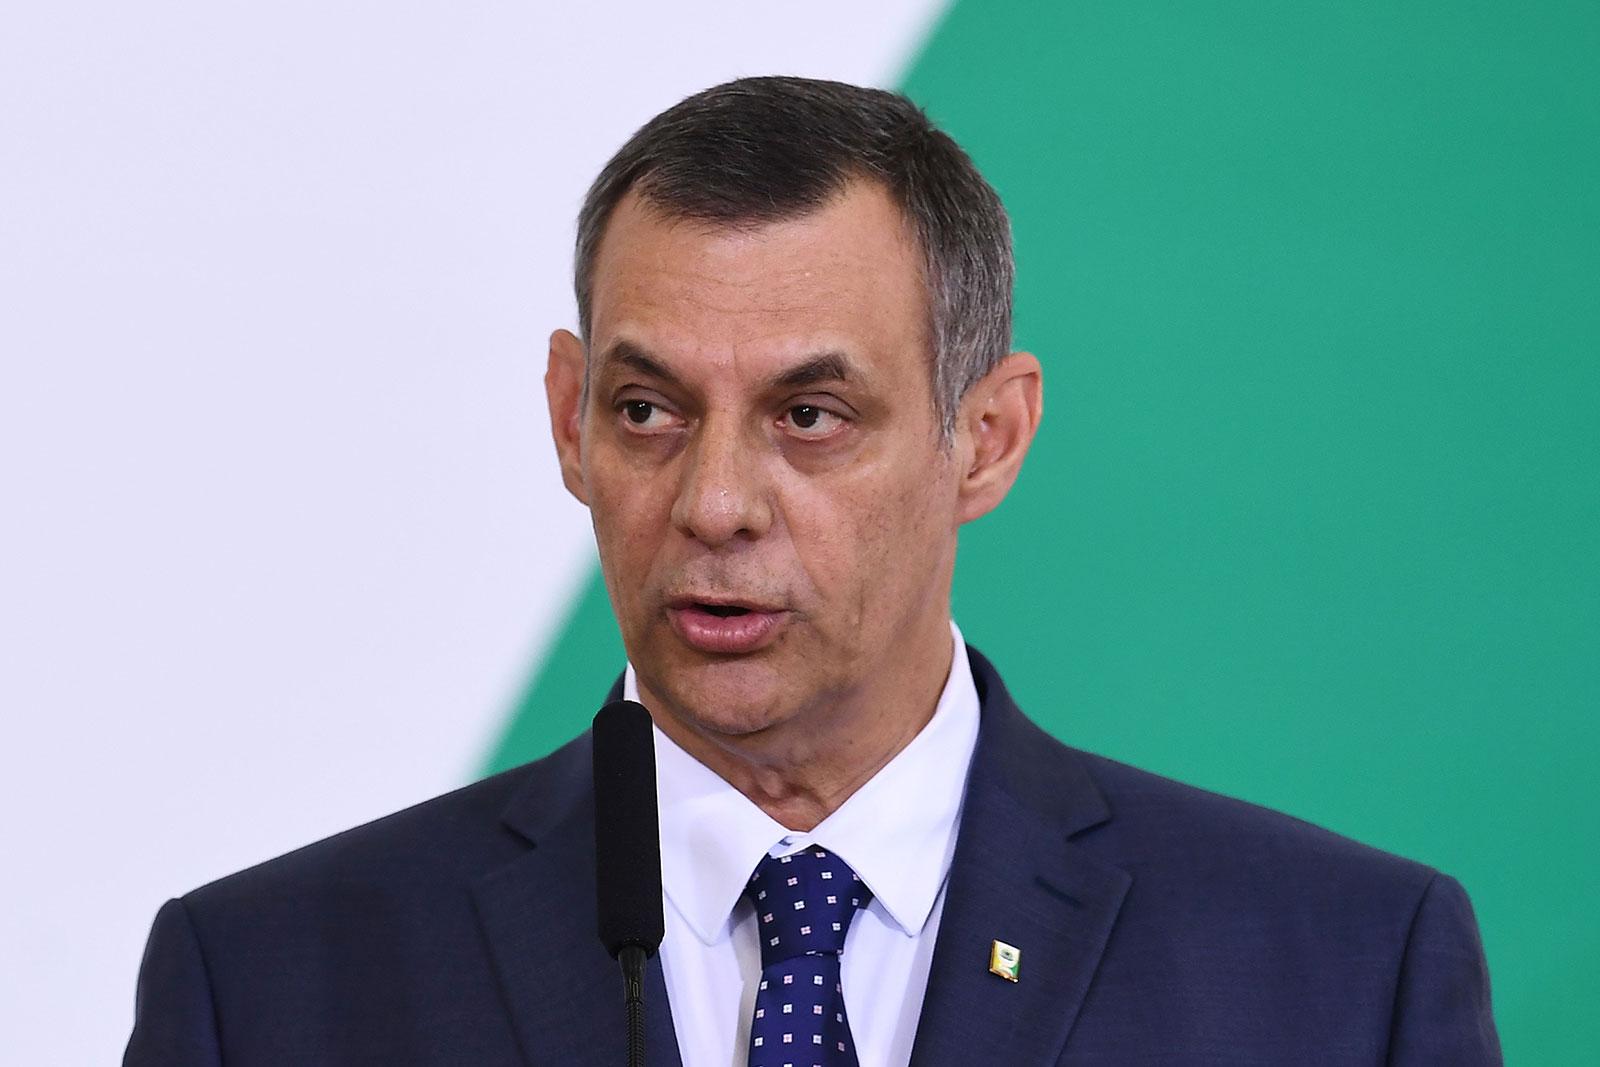 Brazilian presidency spokesman Otavio Rêgo Barros speaks at the Planalto Palace in Brasilia, on April 11, 2019.